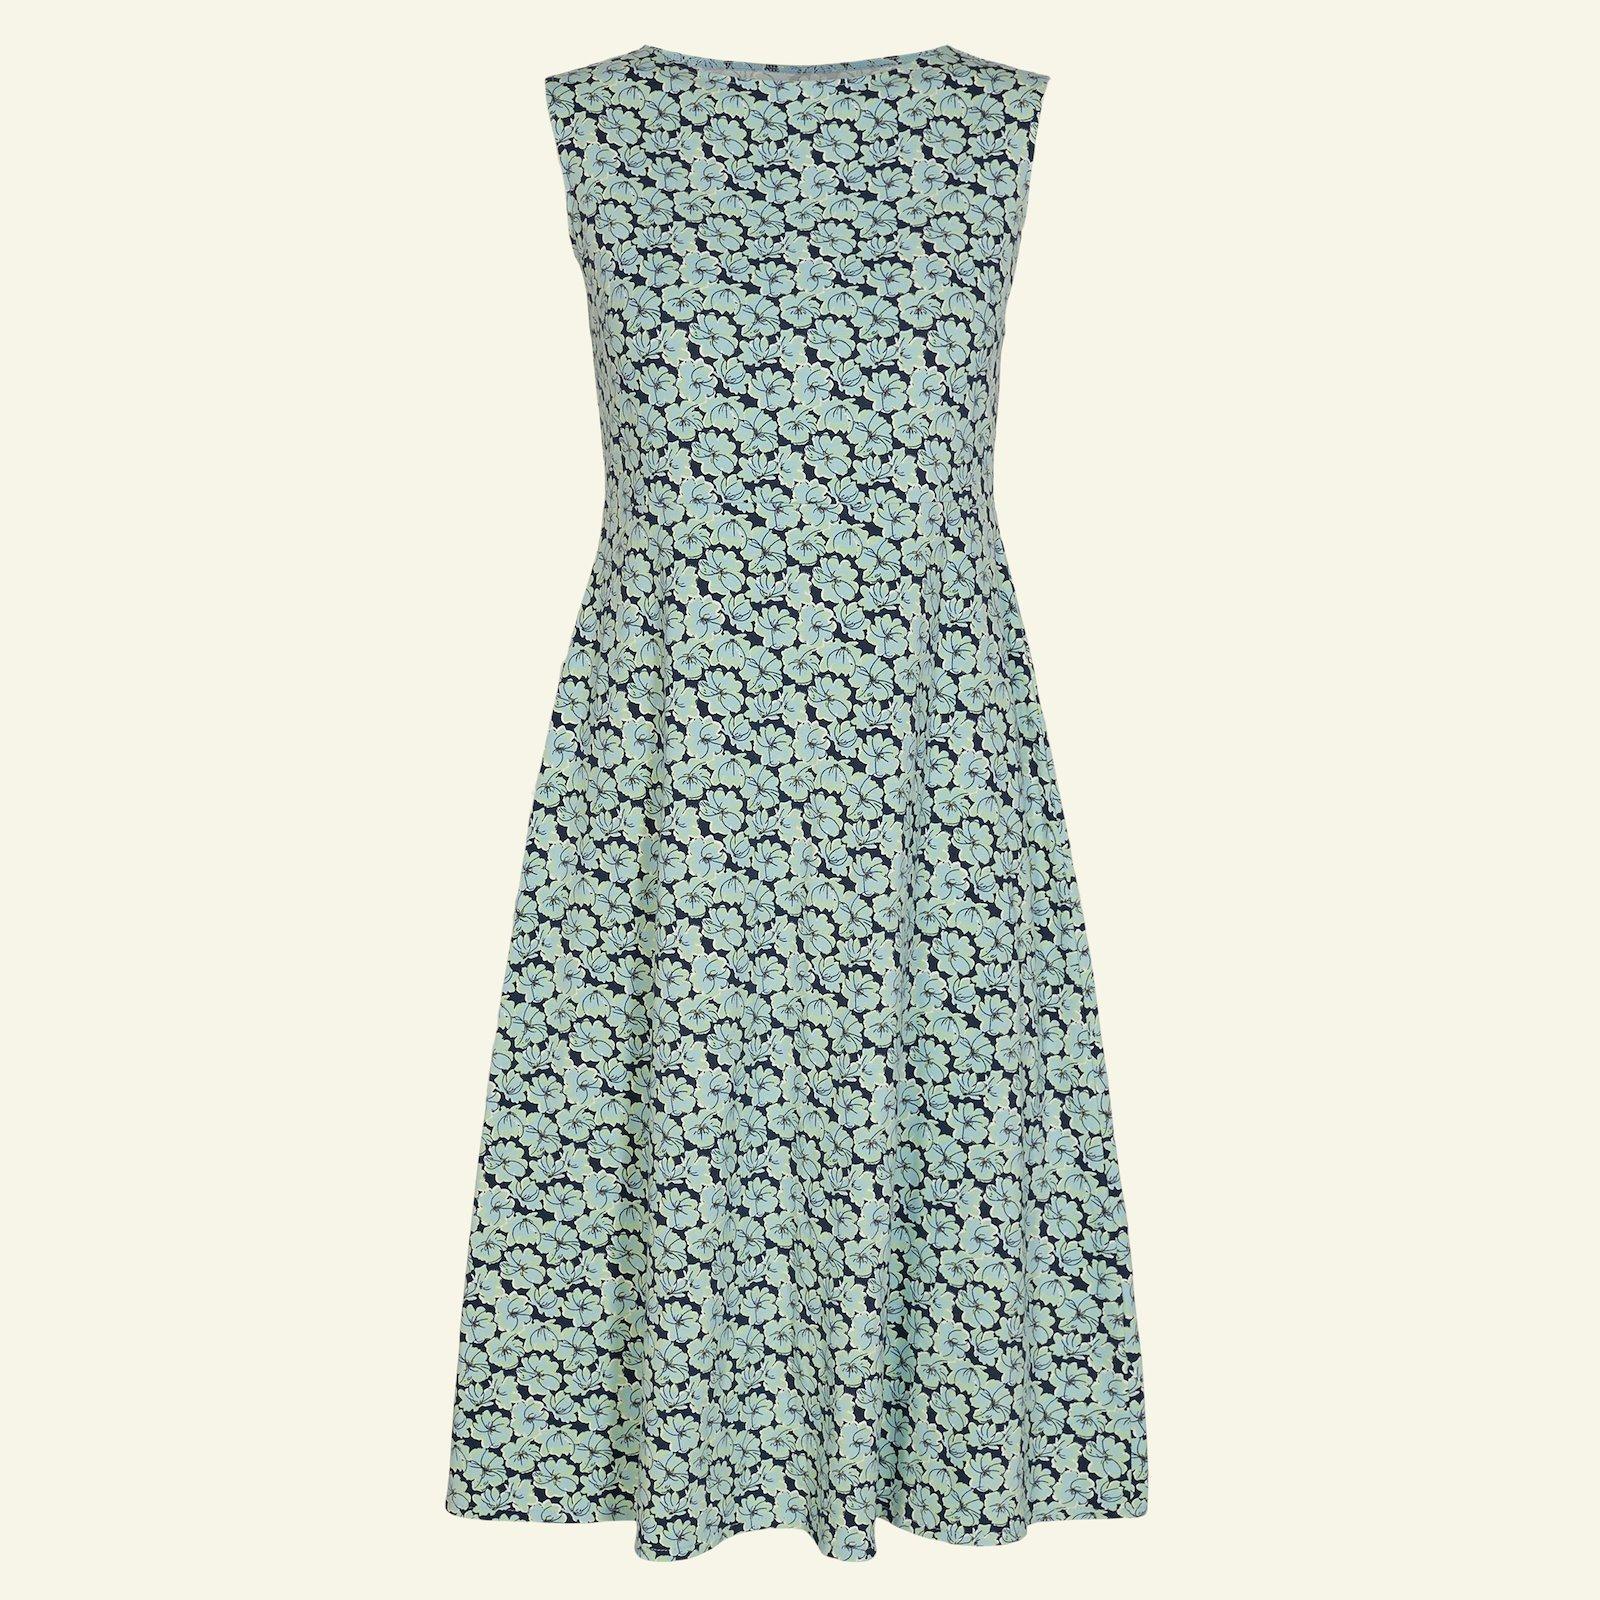 Dress with a full skirt, 34/6 p23154_272698_sskit